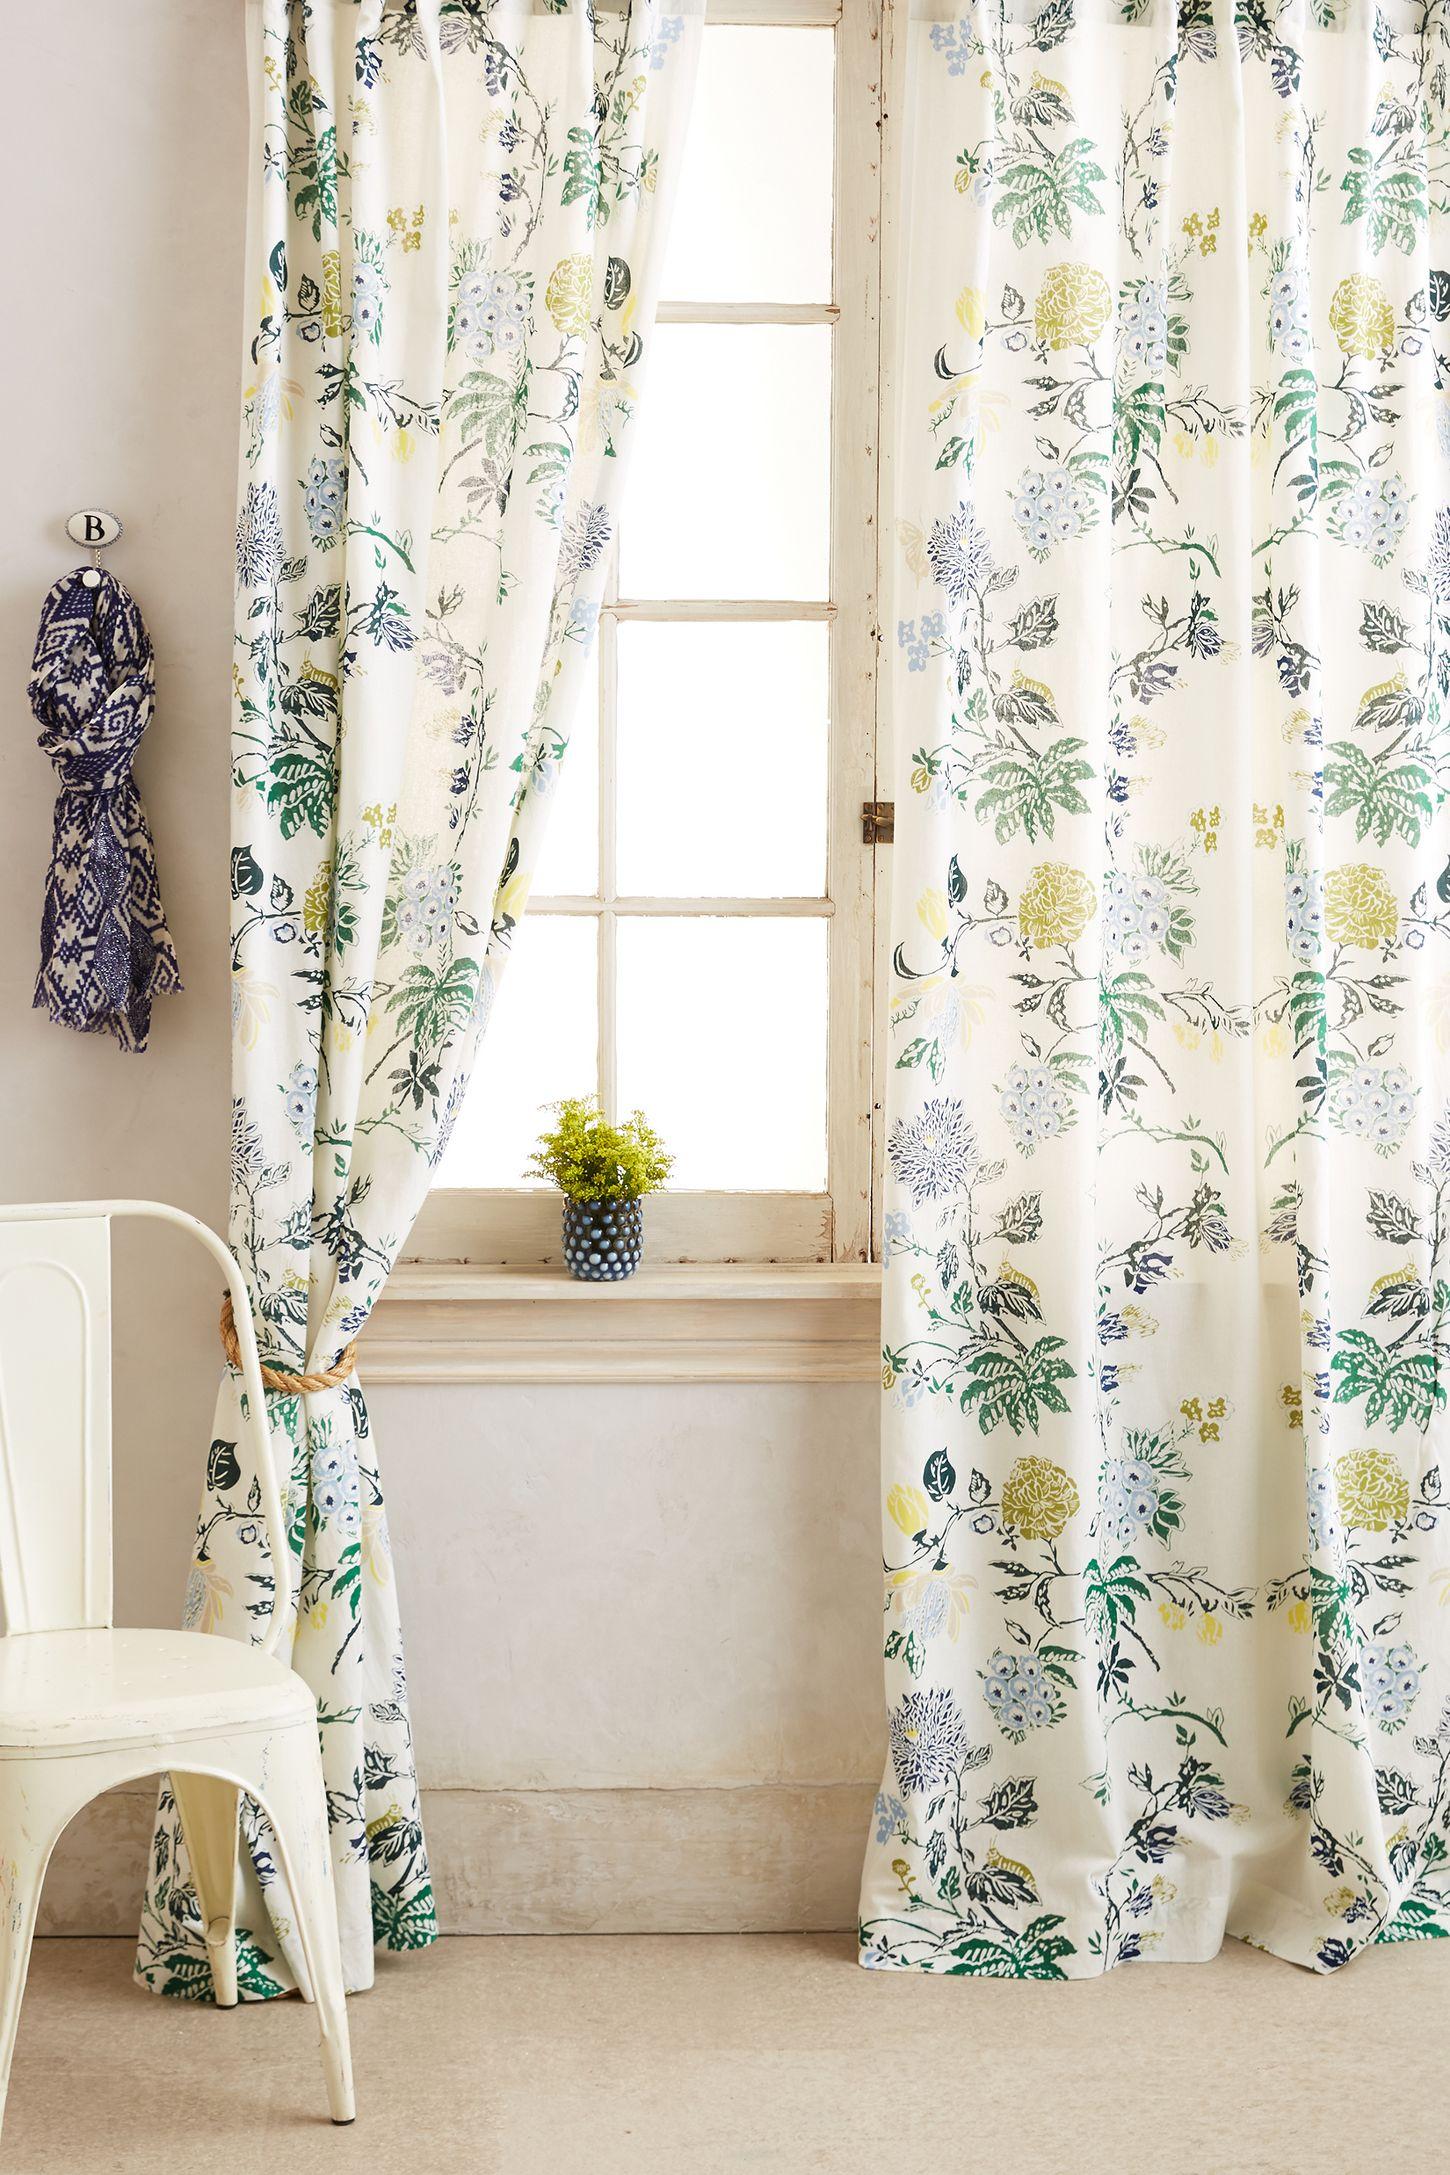 Anthropologie floral shower curtain - Anthropologie Floral Shower Curtain 35